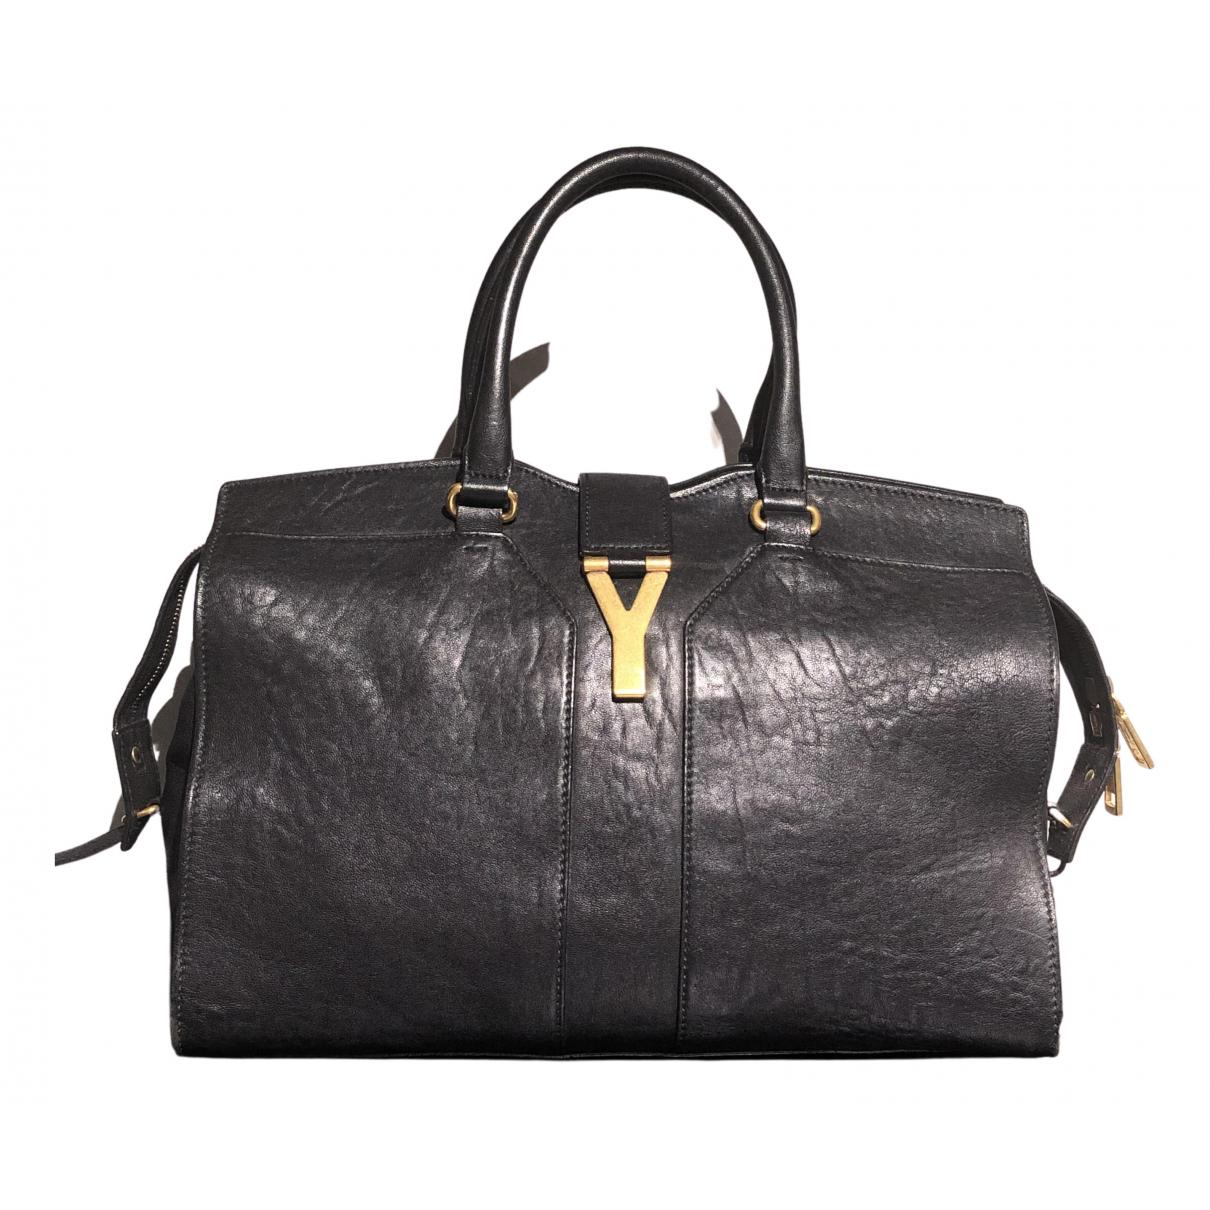 Yves Saint Laurent Chyc Handtasche in  Schwarz Leder